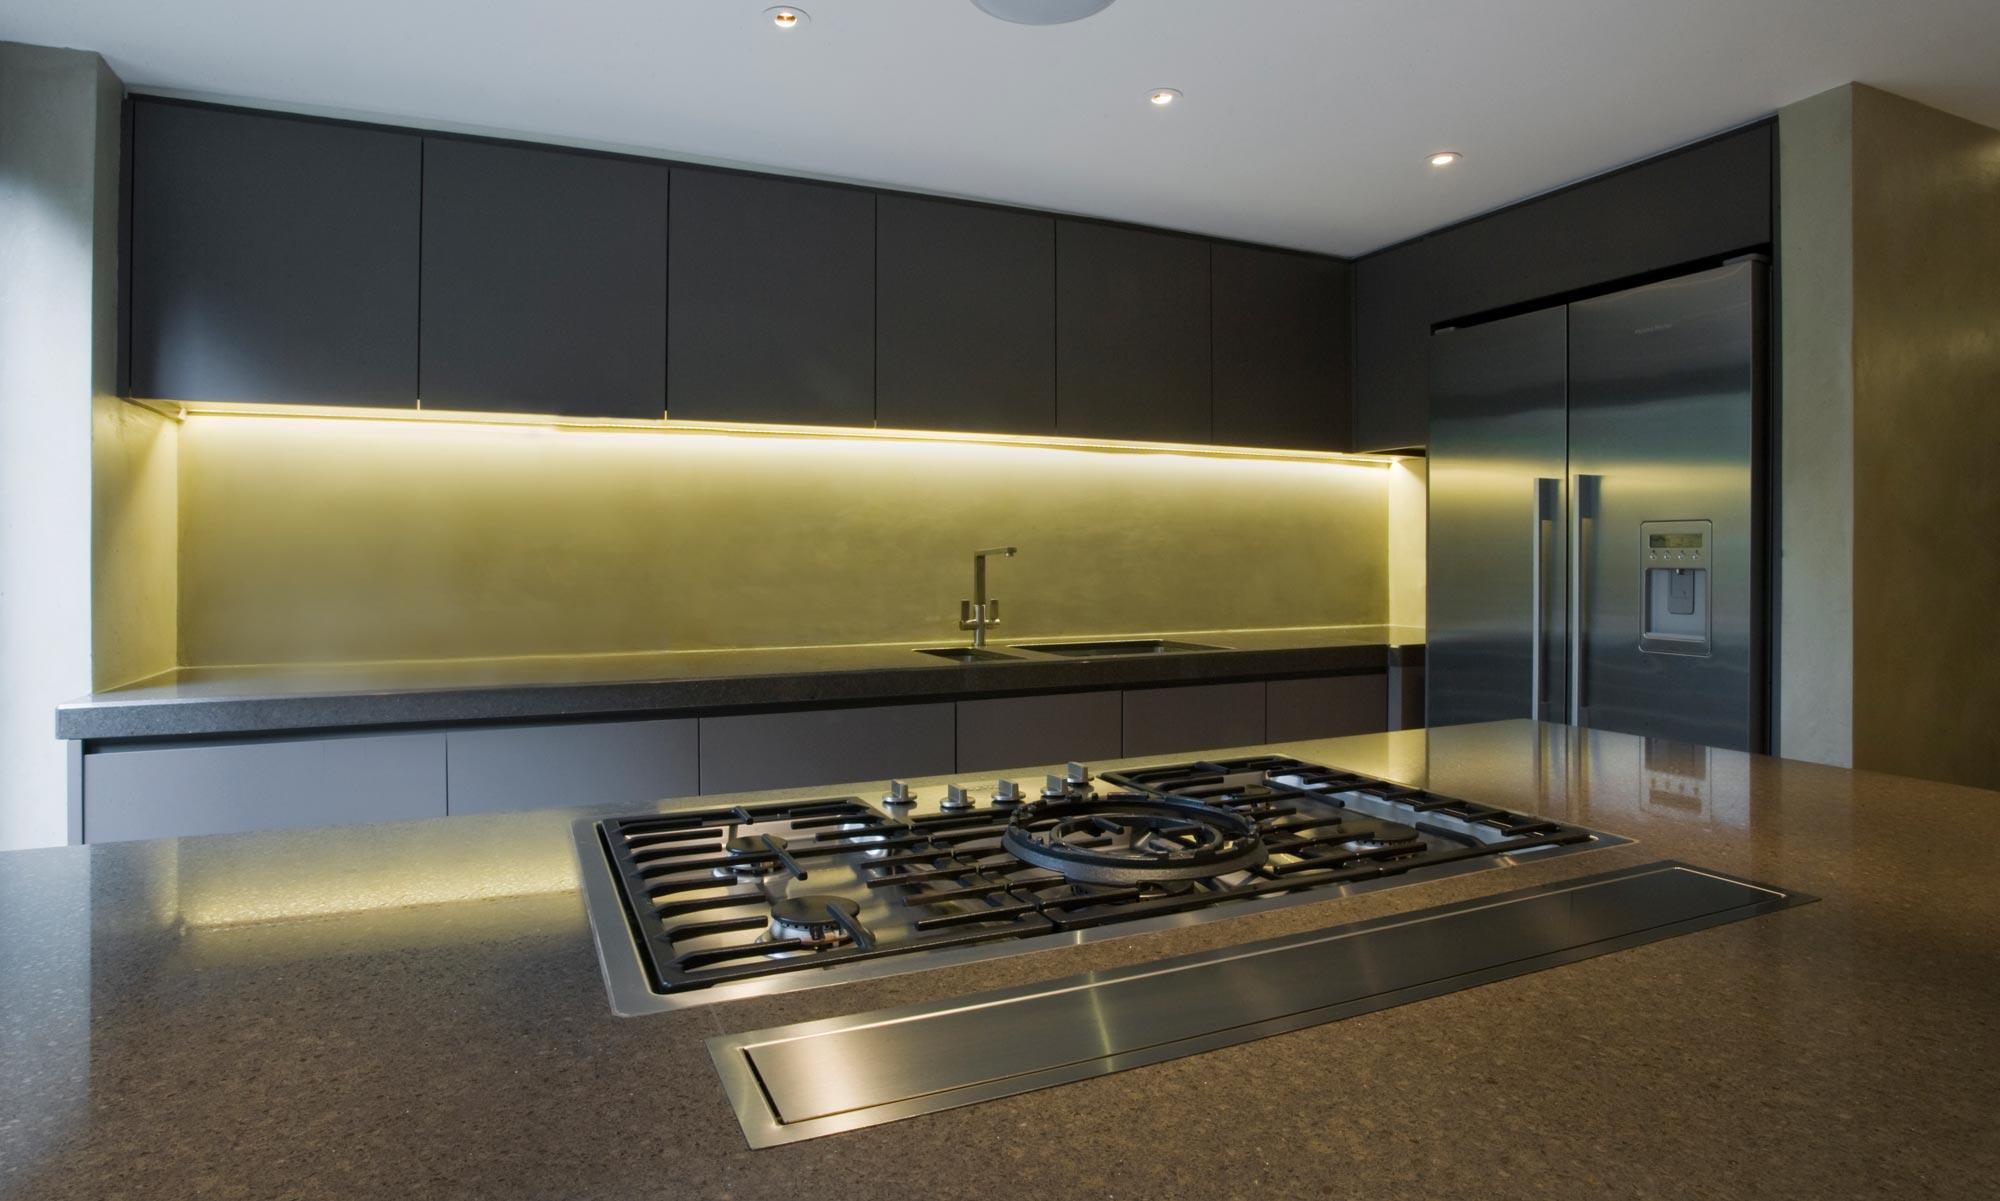 Bespoke kitchens london by wyndham design for Bespoke kitchen design